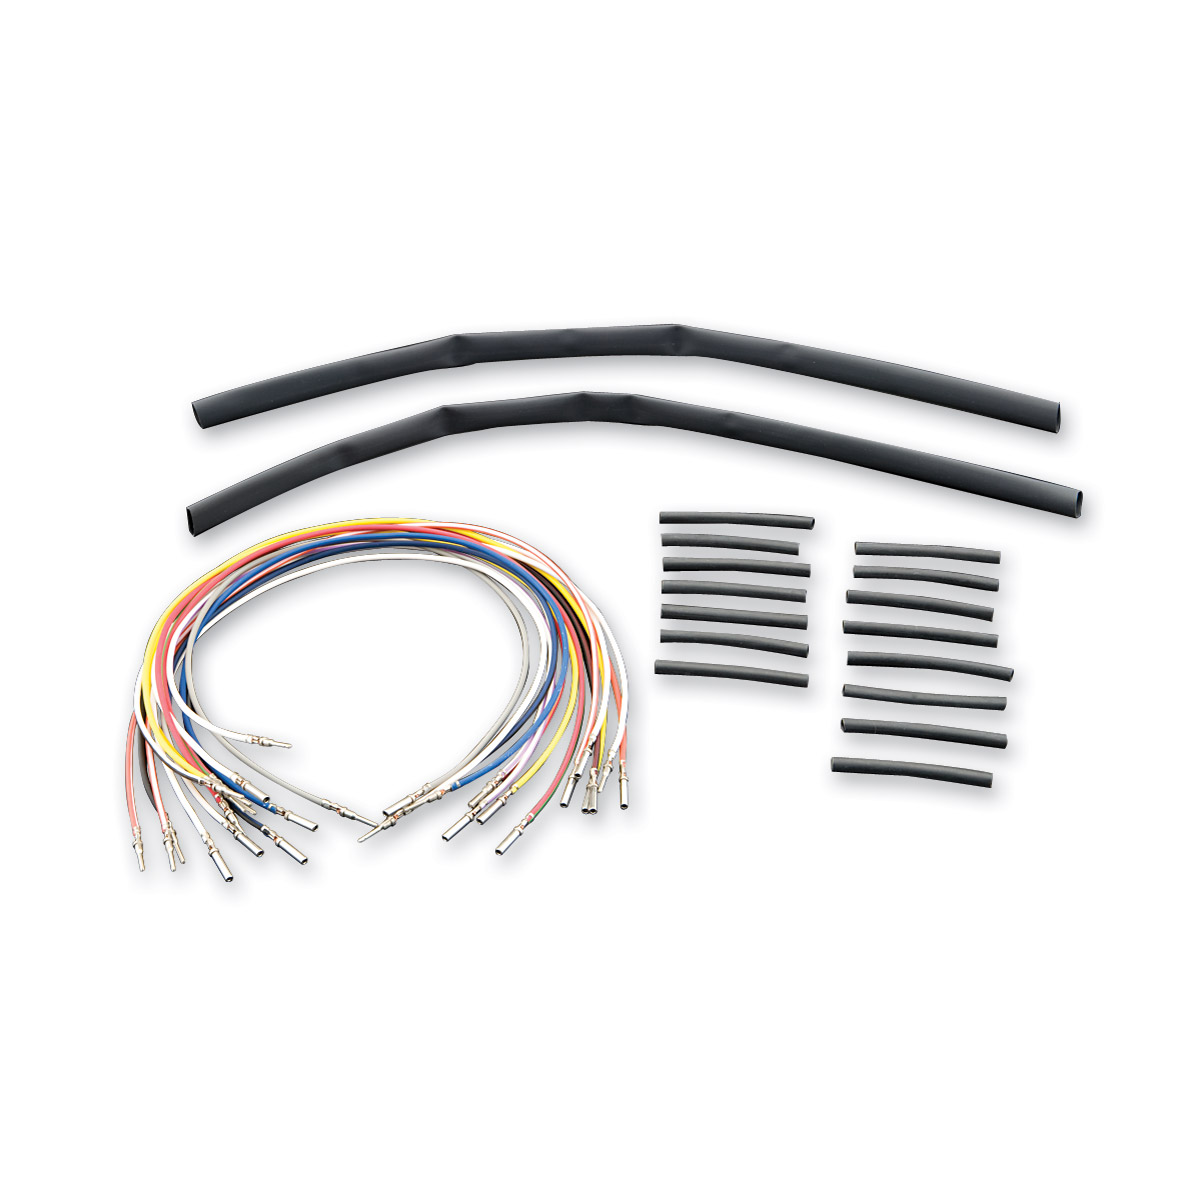 Novello Handlebar Wiring Harness Extension : Novello ″ handlebar wiring harness extension with cruise